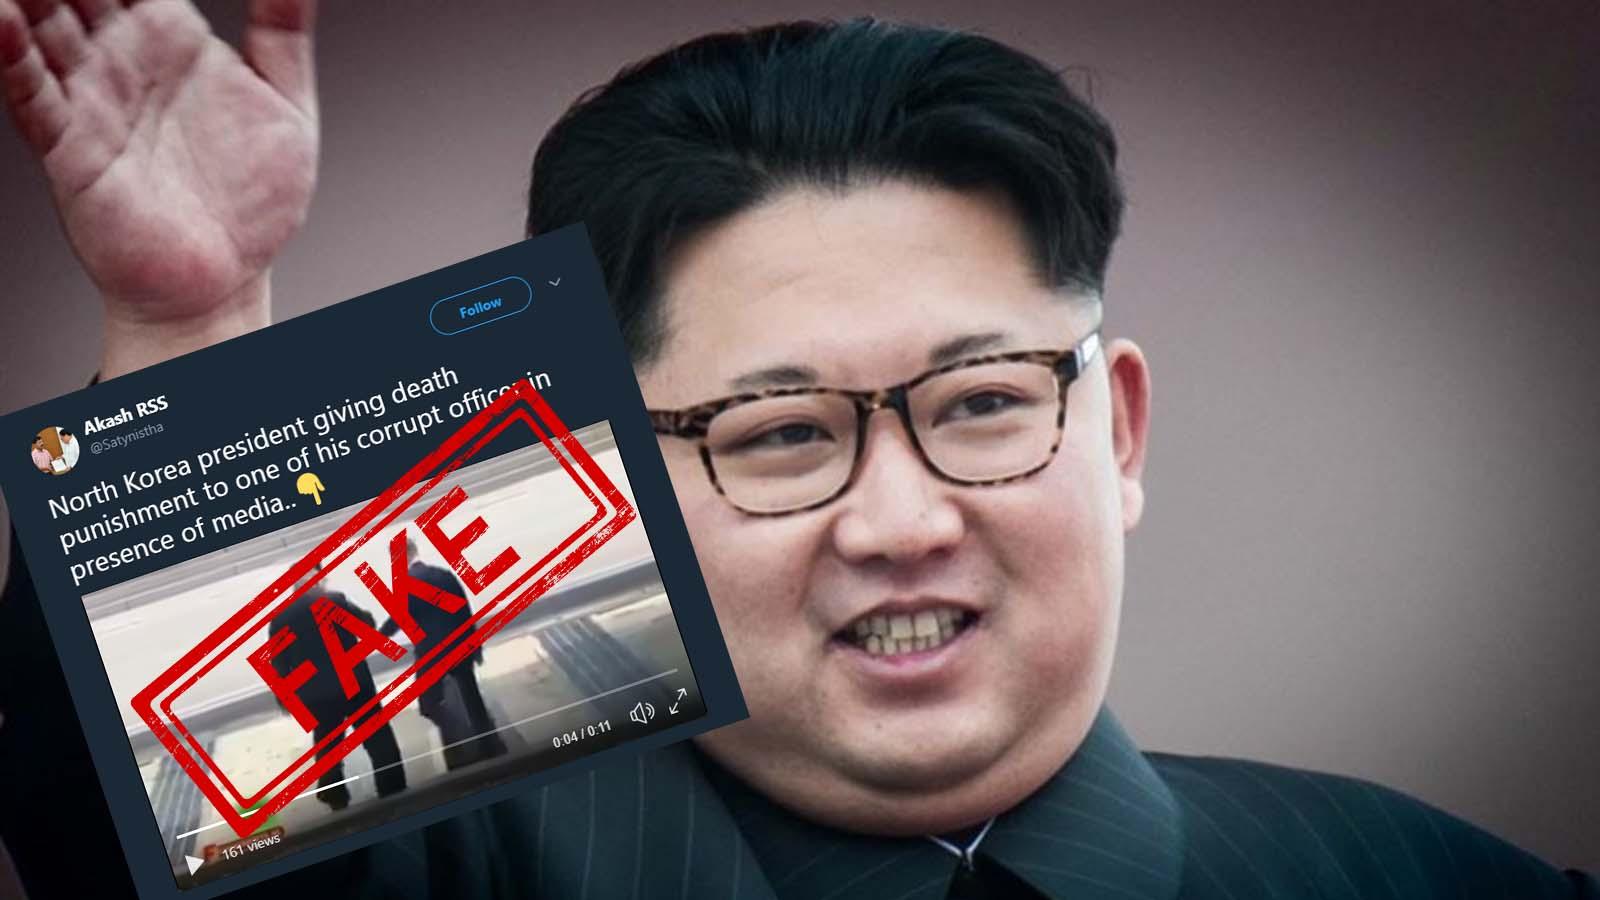 Kim Jong Un, death, punishment, corrupt, officer, NewsMobile, Mobile News, Fake News, Fact Checker, Fact Check, India, North korea, North Korea, Moon Jae-in, President, India